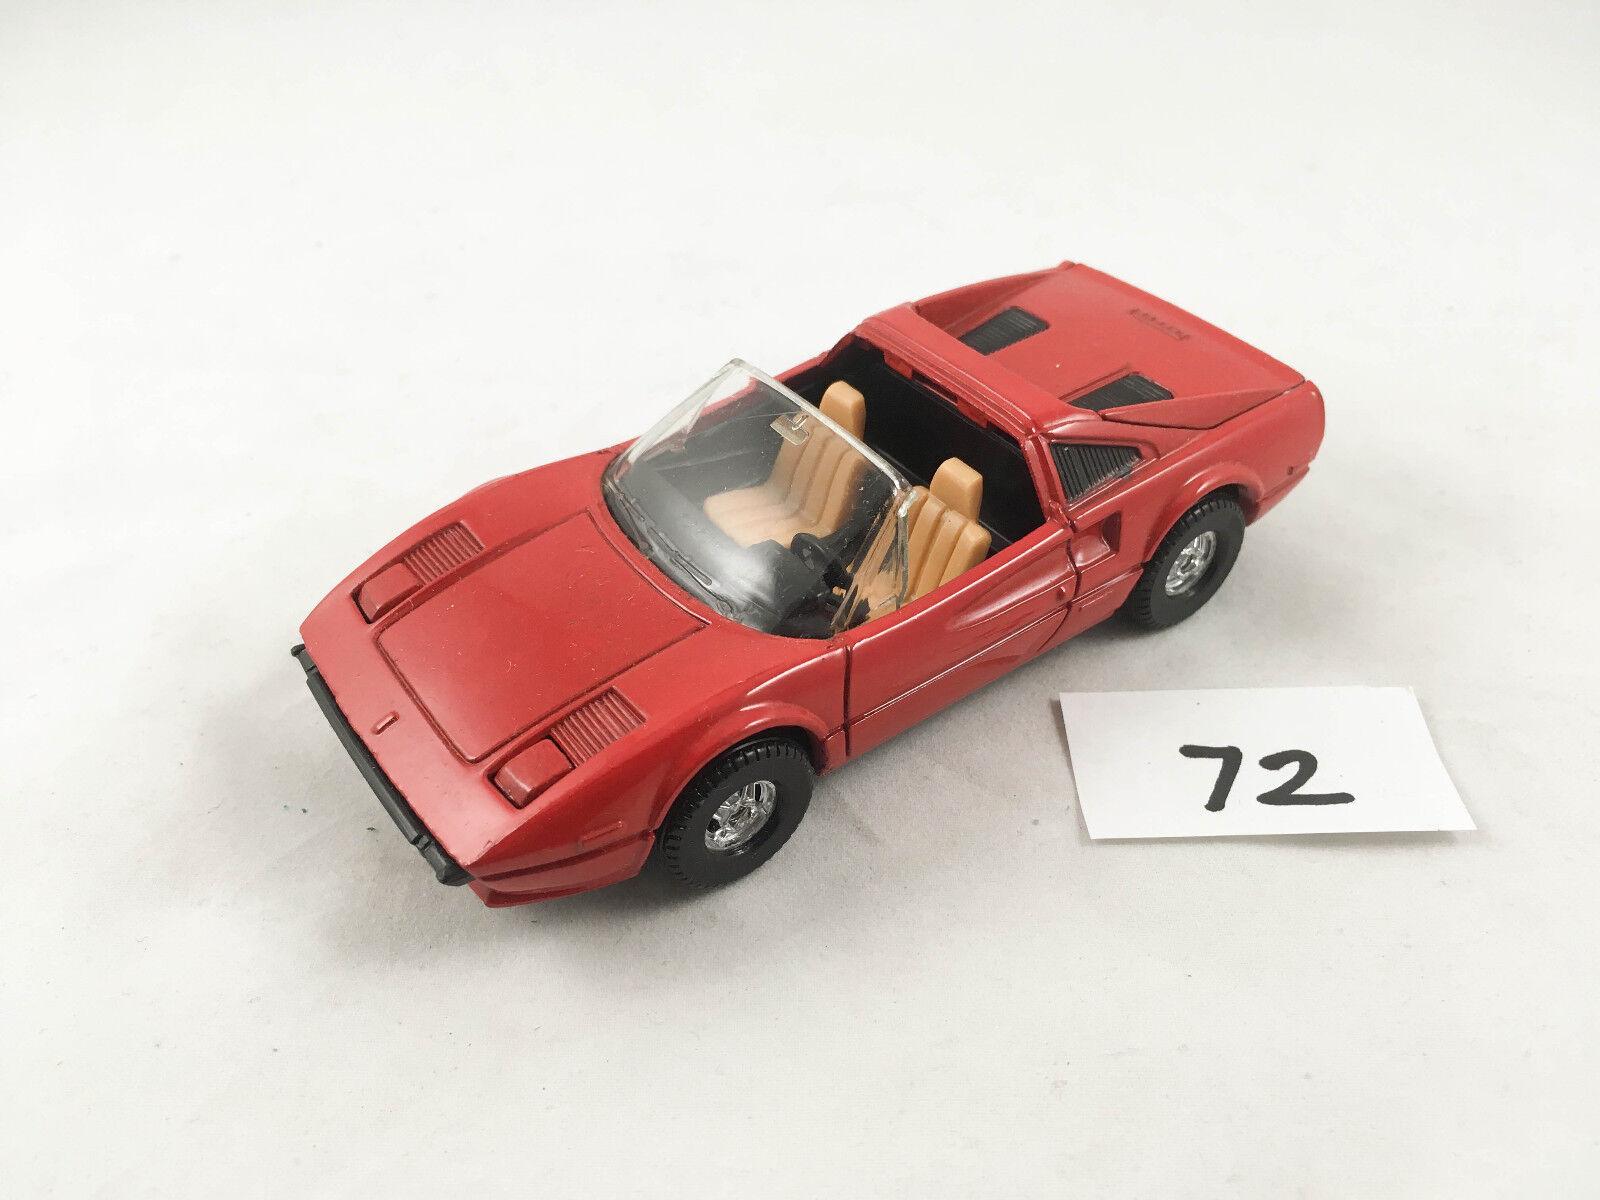 RARE CORGI TOYS FERRARI 308 GTS MAGNUM PI TV SERIES SERIES SERIES CAR DIECAST 1980S 83d954